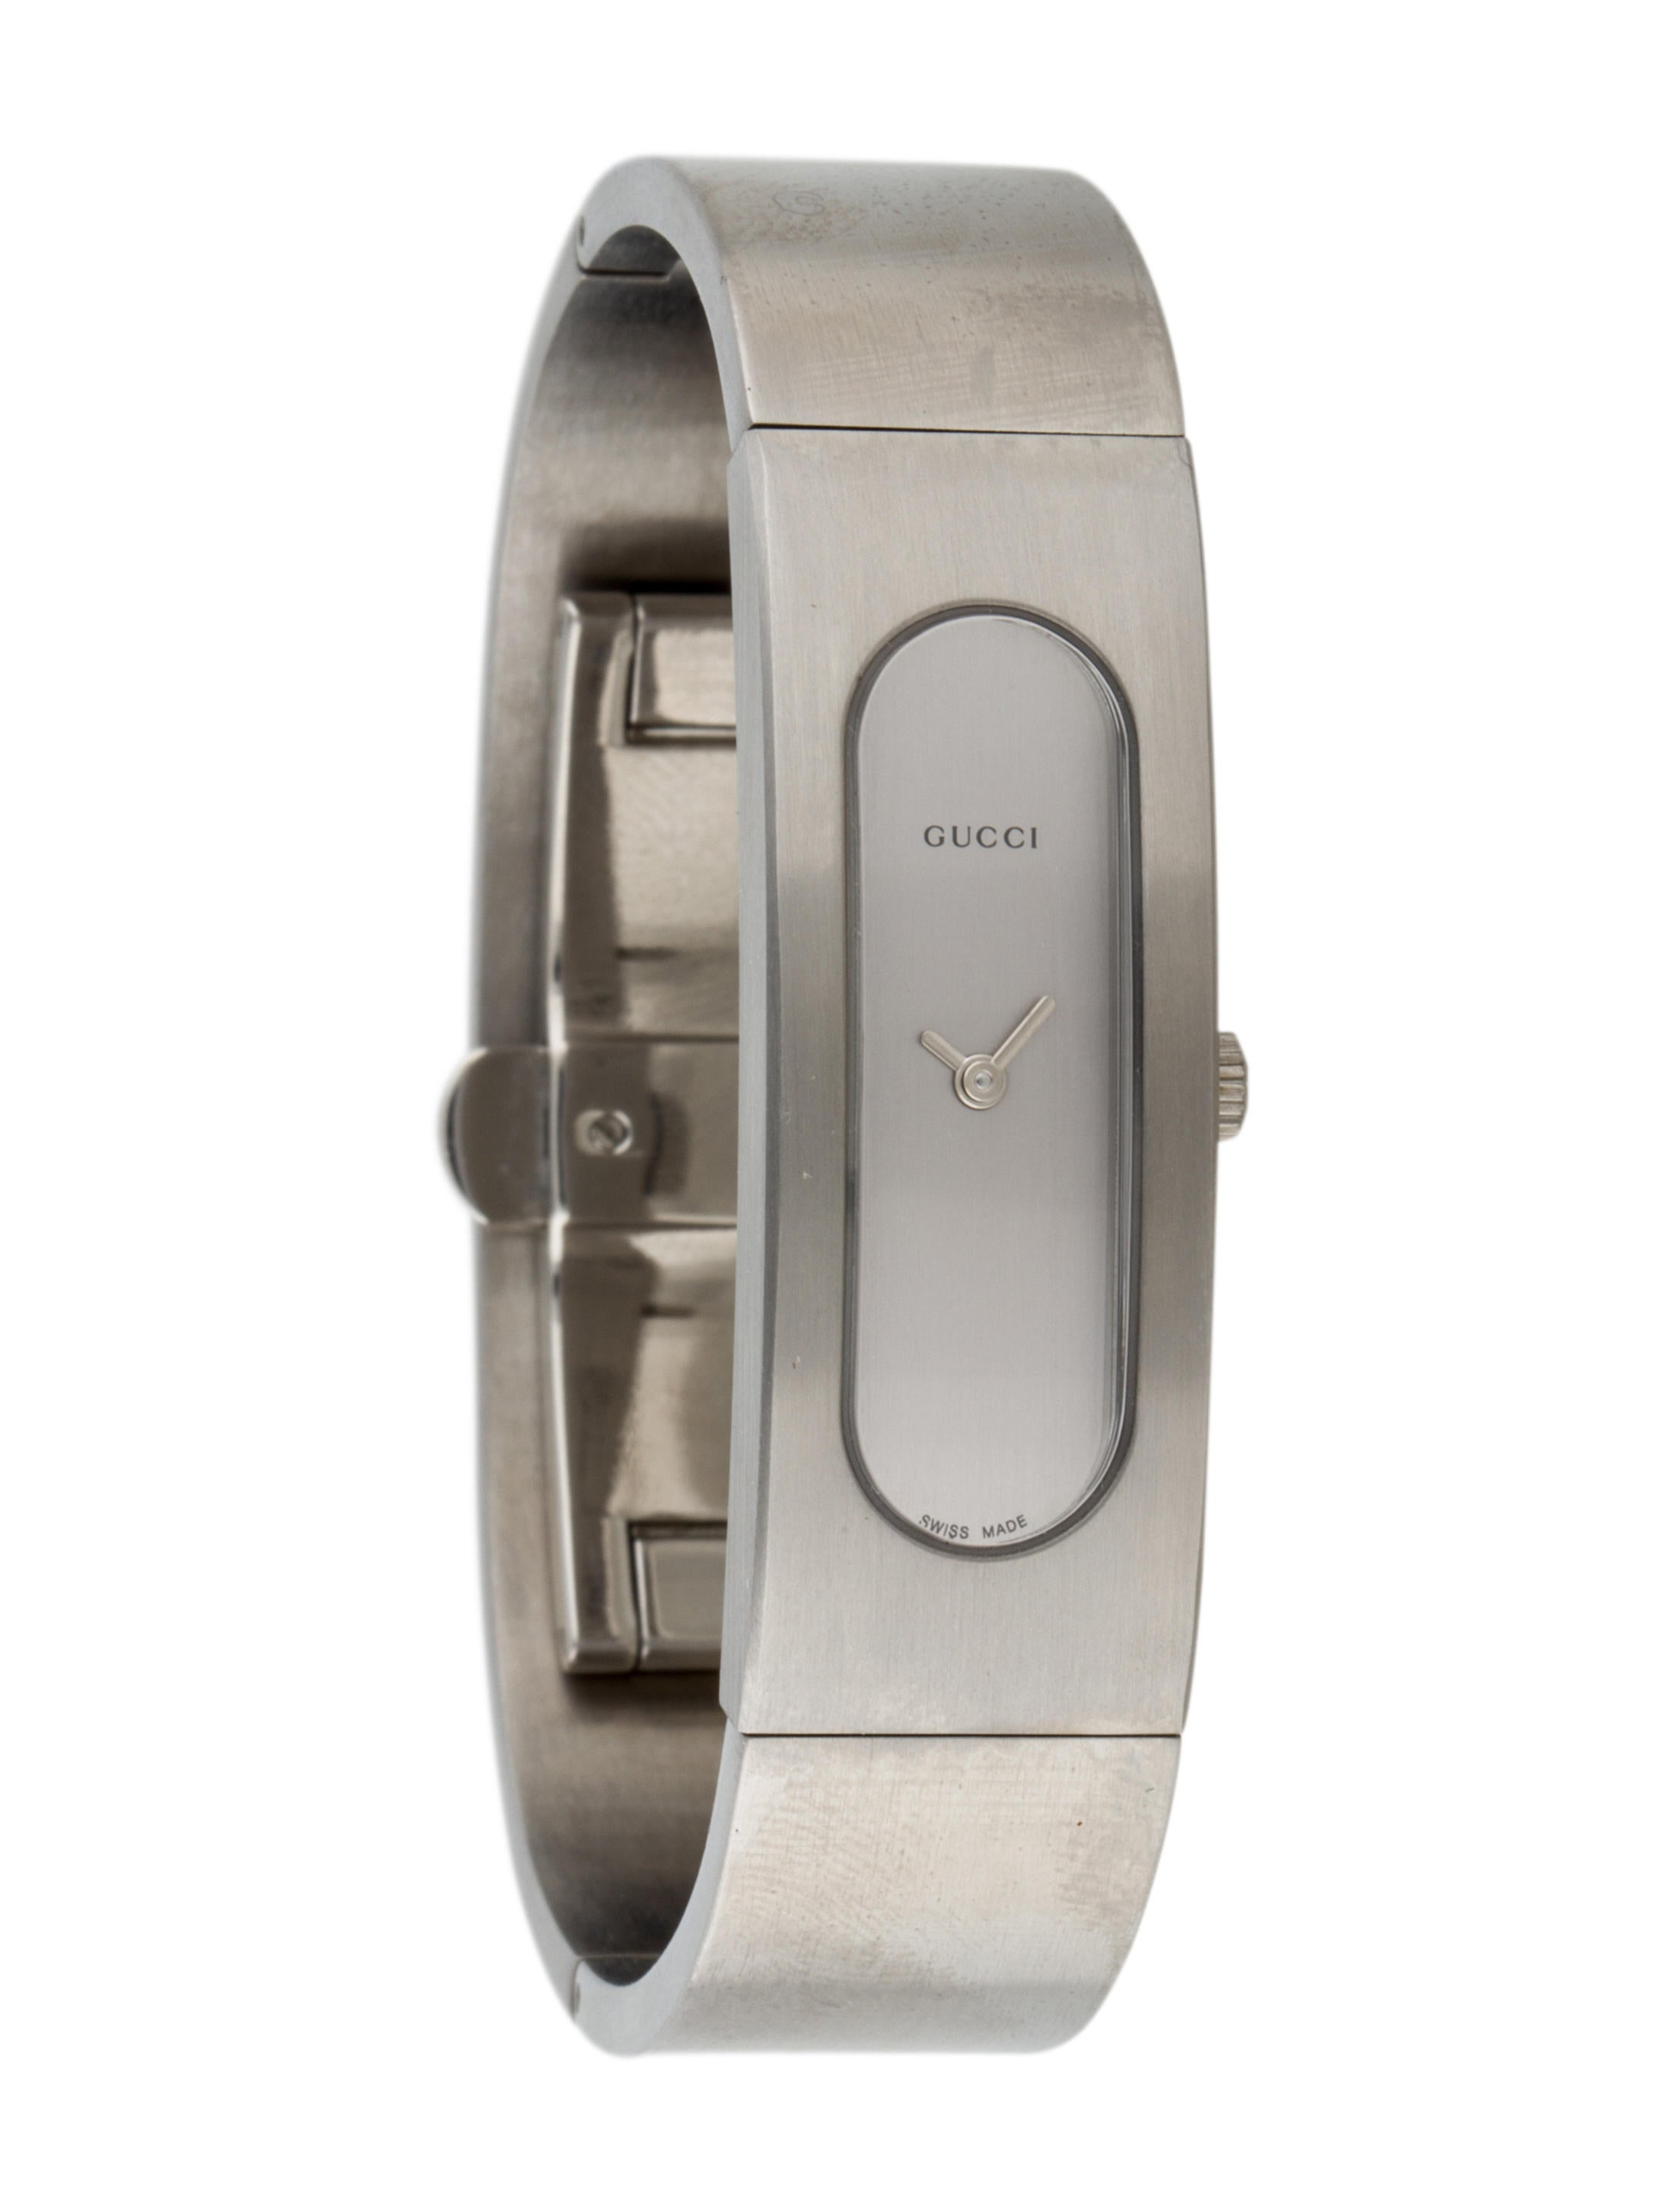 2c402537182 Gucci 2400S Watch w  Tags - Bracelet - GUC76195